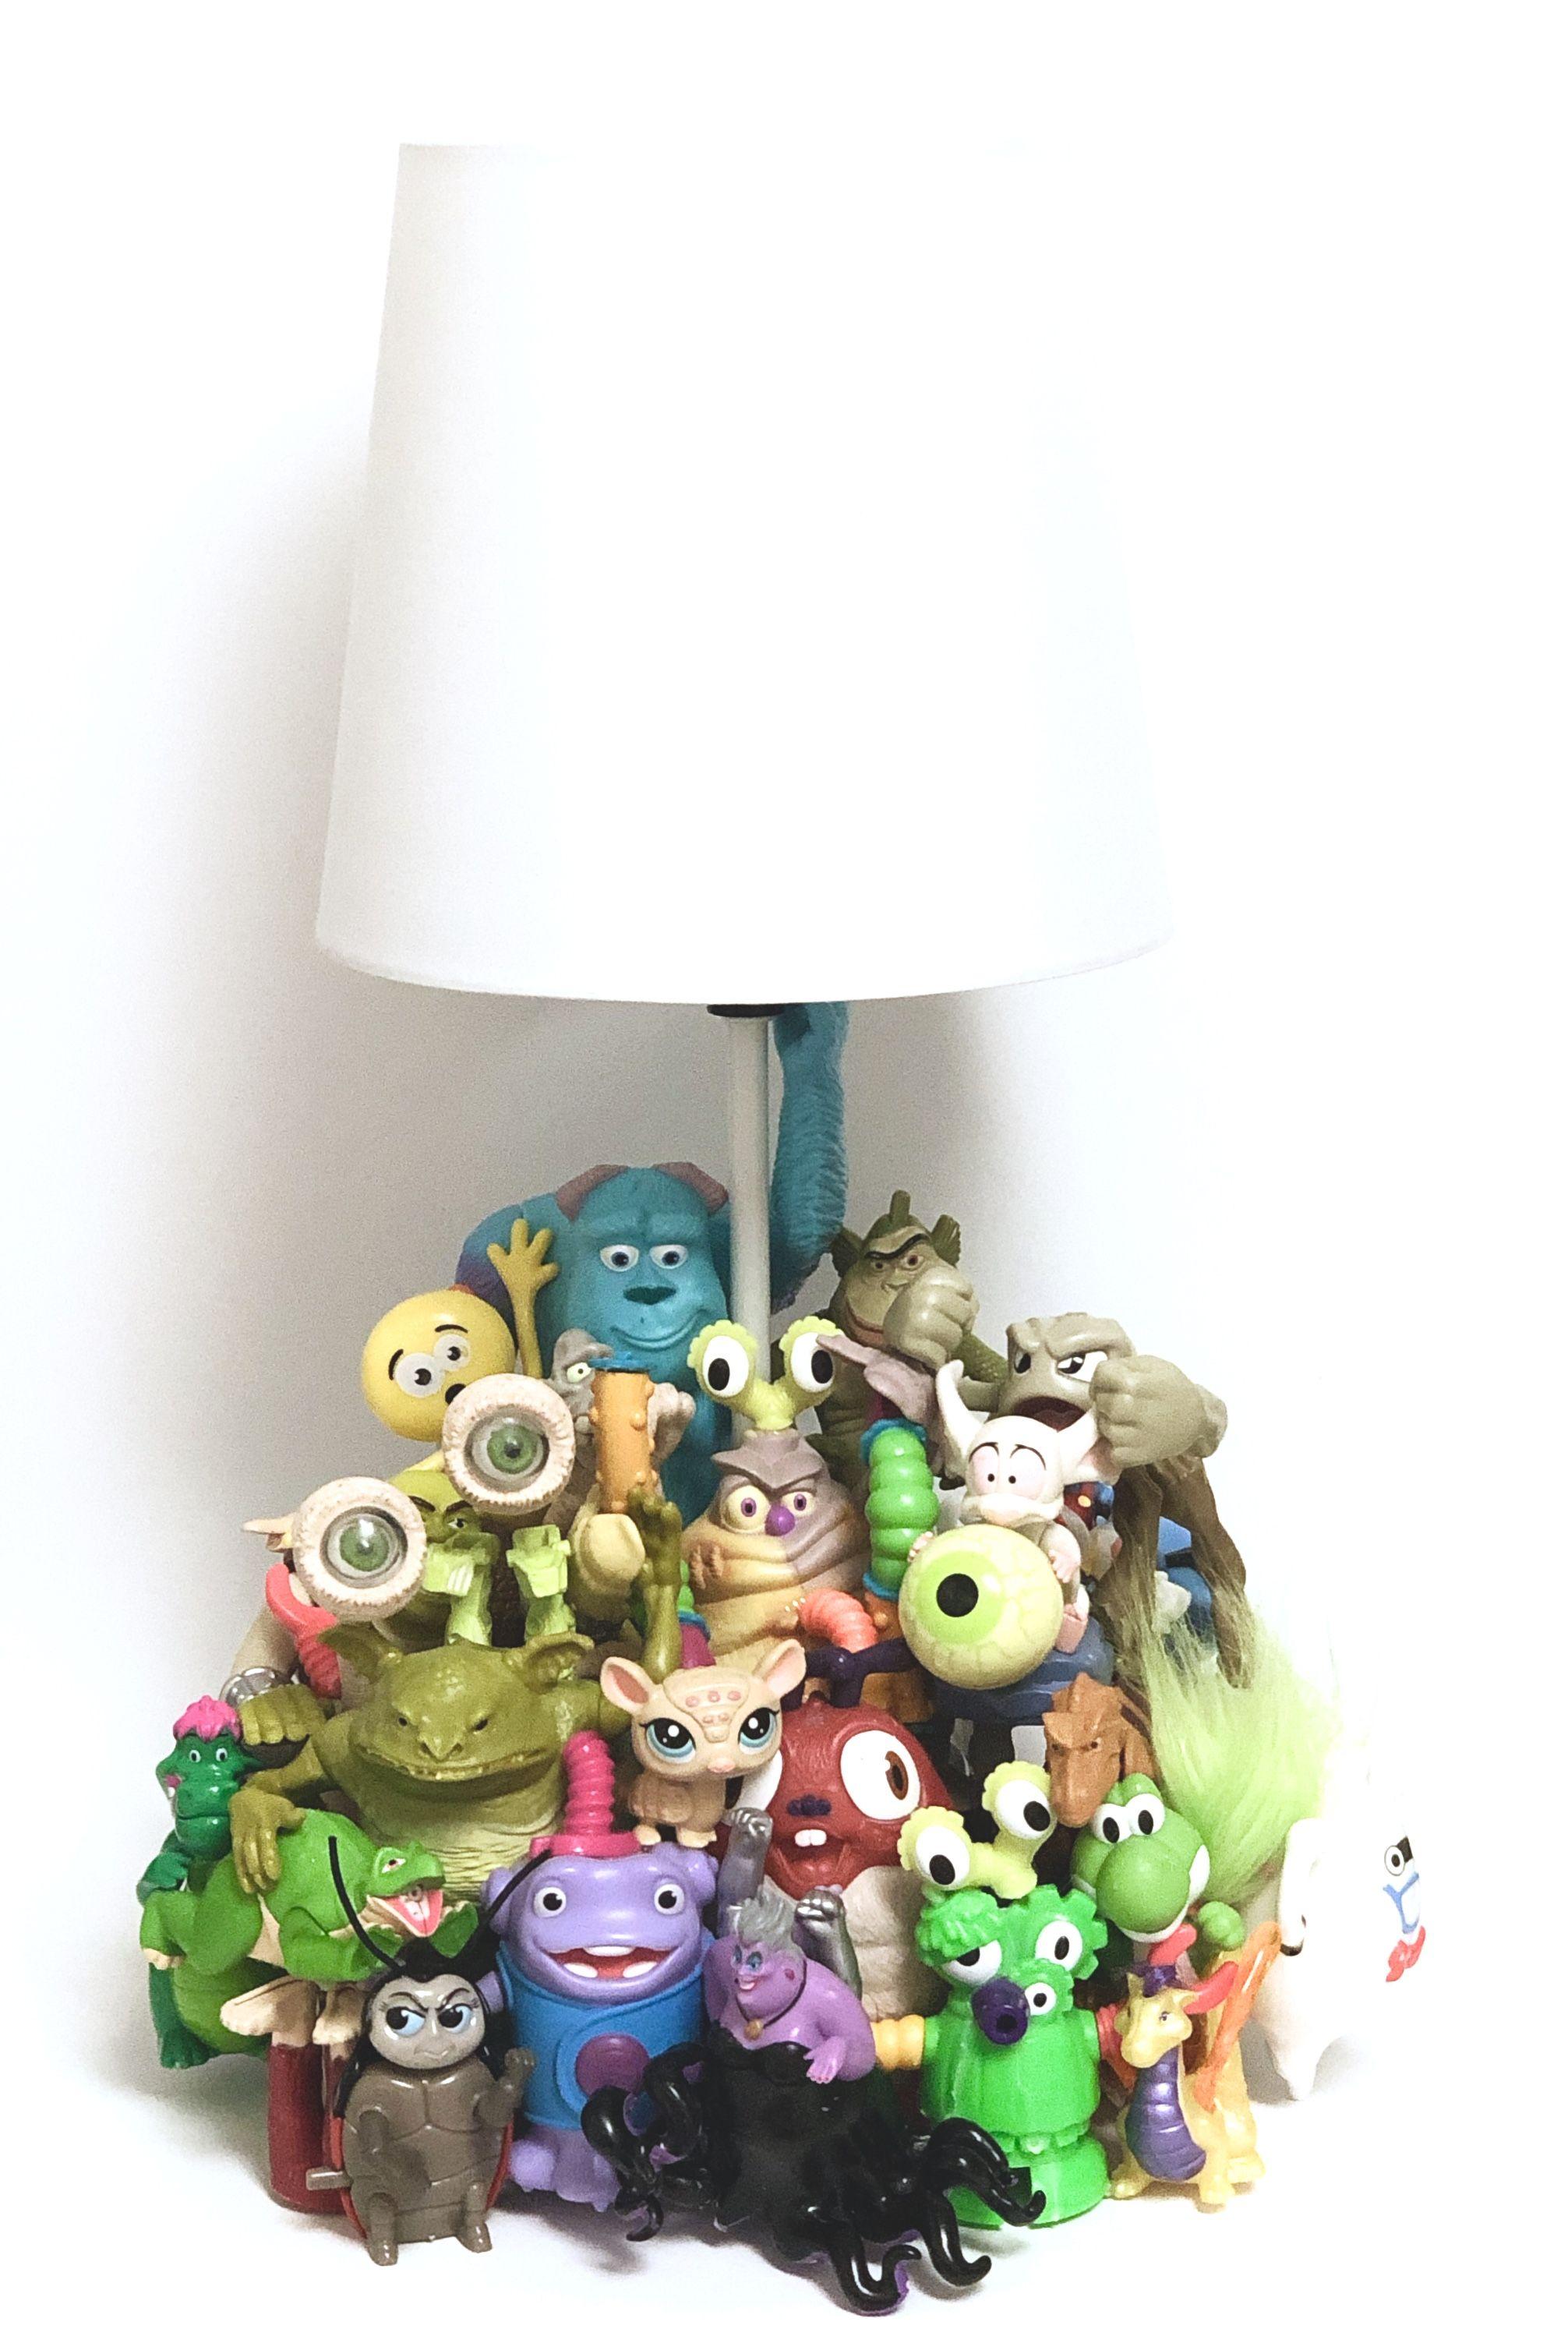 Disney Theme Room Monsters Inc Lamp Shrek Bedroom Disney Theme Room Art Toy Custom Toys Unique Items Products